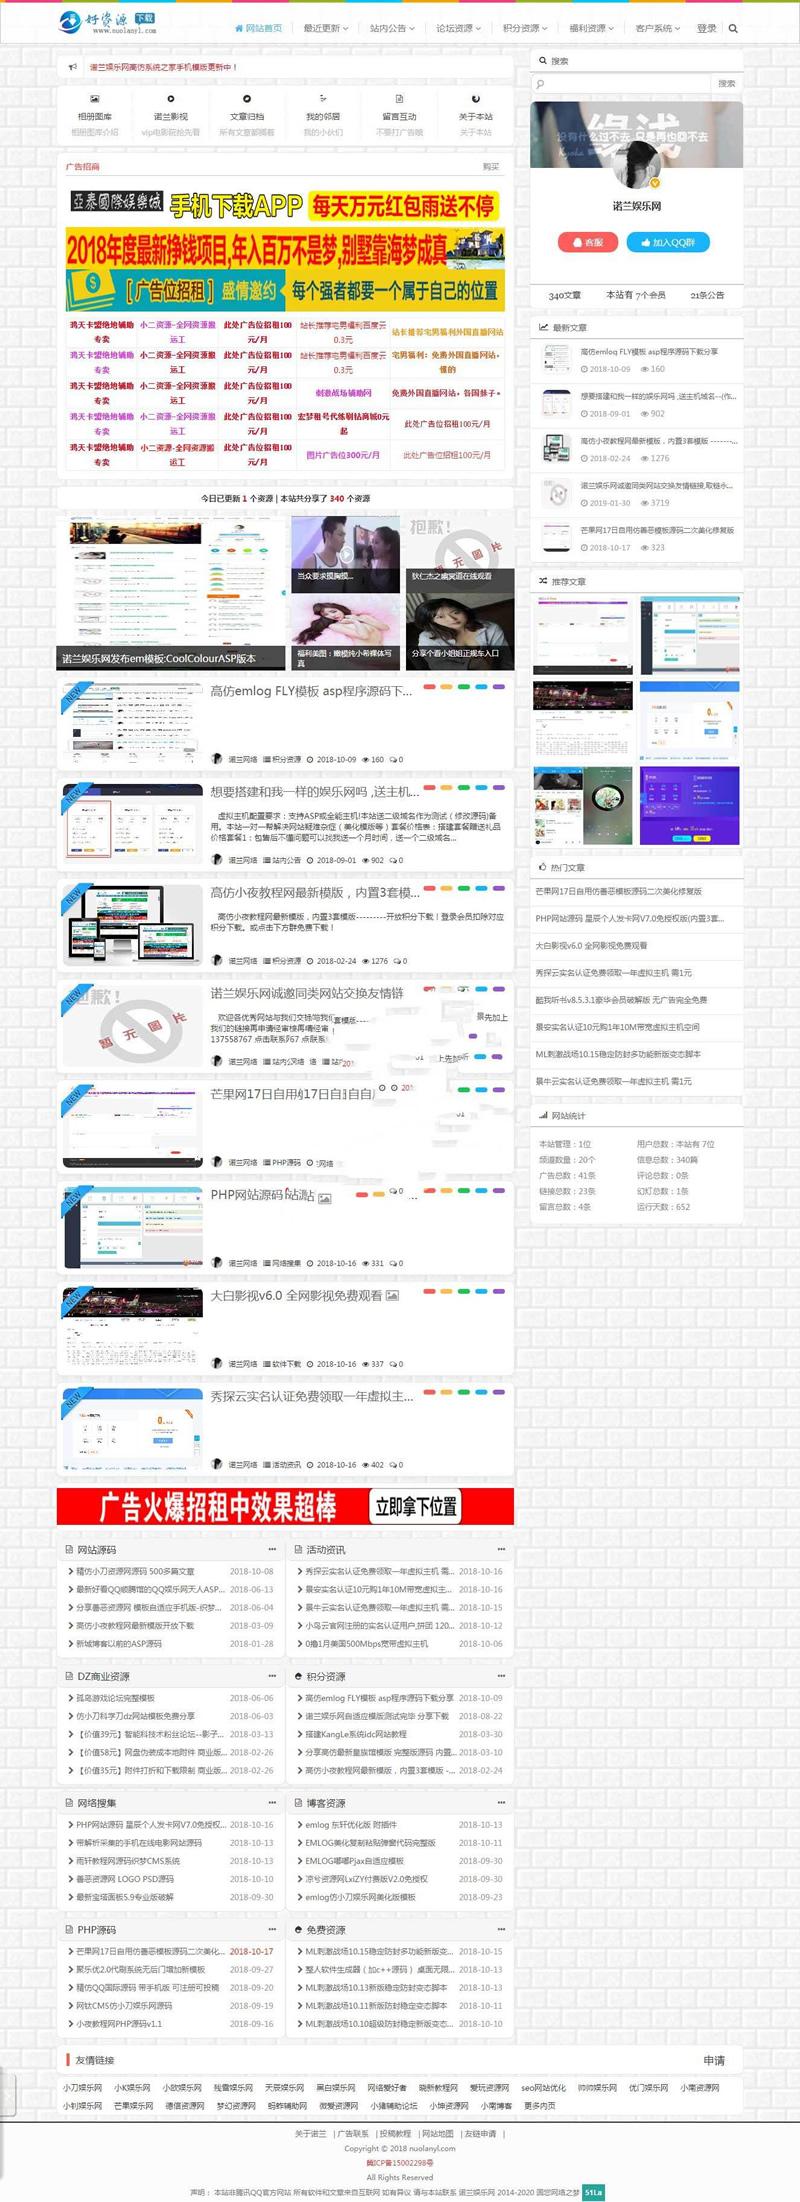 Emlog教程资源下载网网站源码 高仿EMLOGfly模板